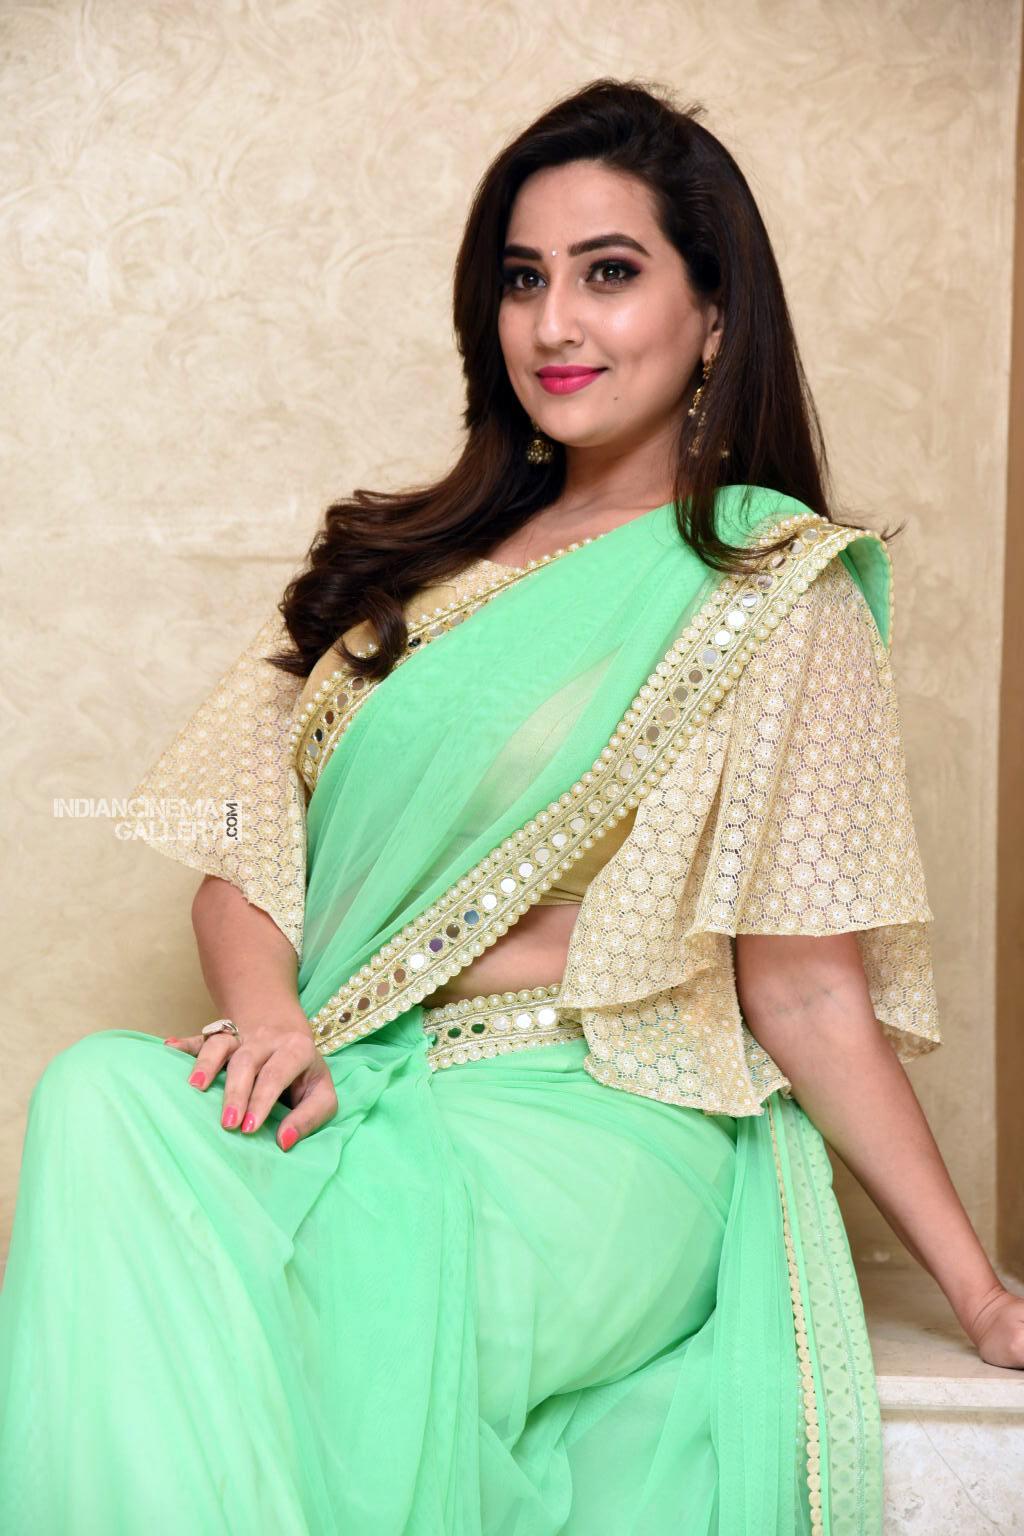 Manjusha at Suvarna Sundhari Movie Trailer Launch (13)